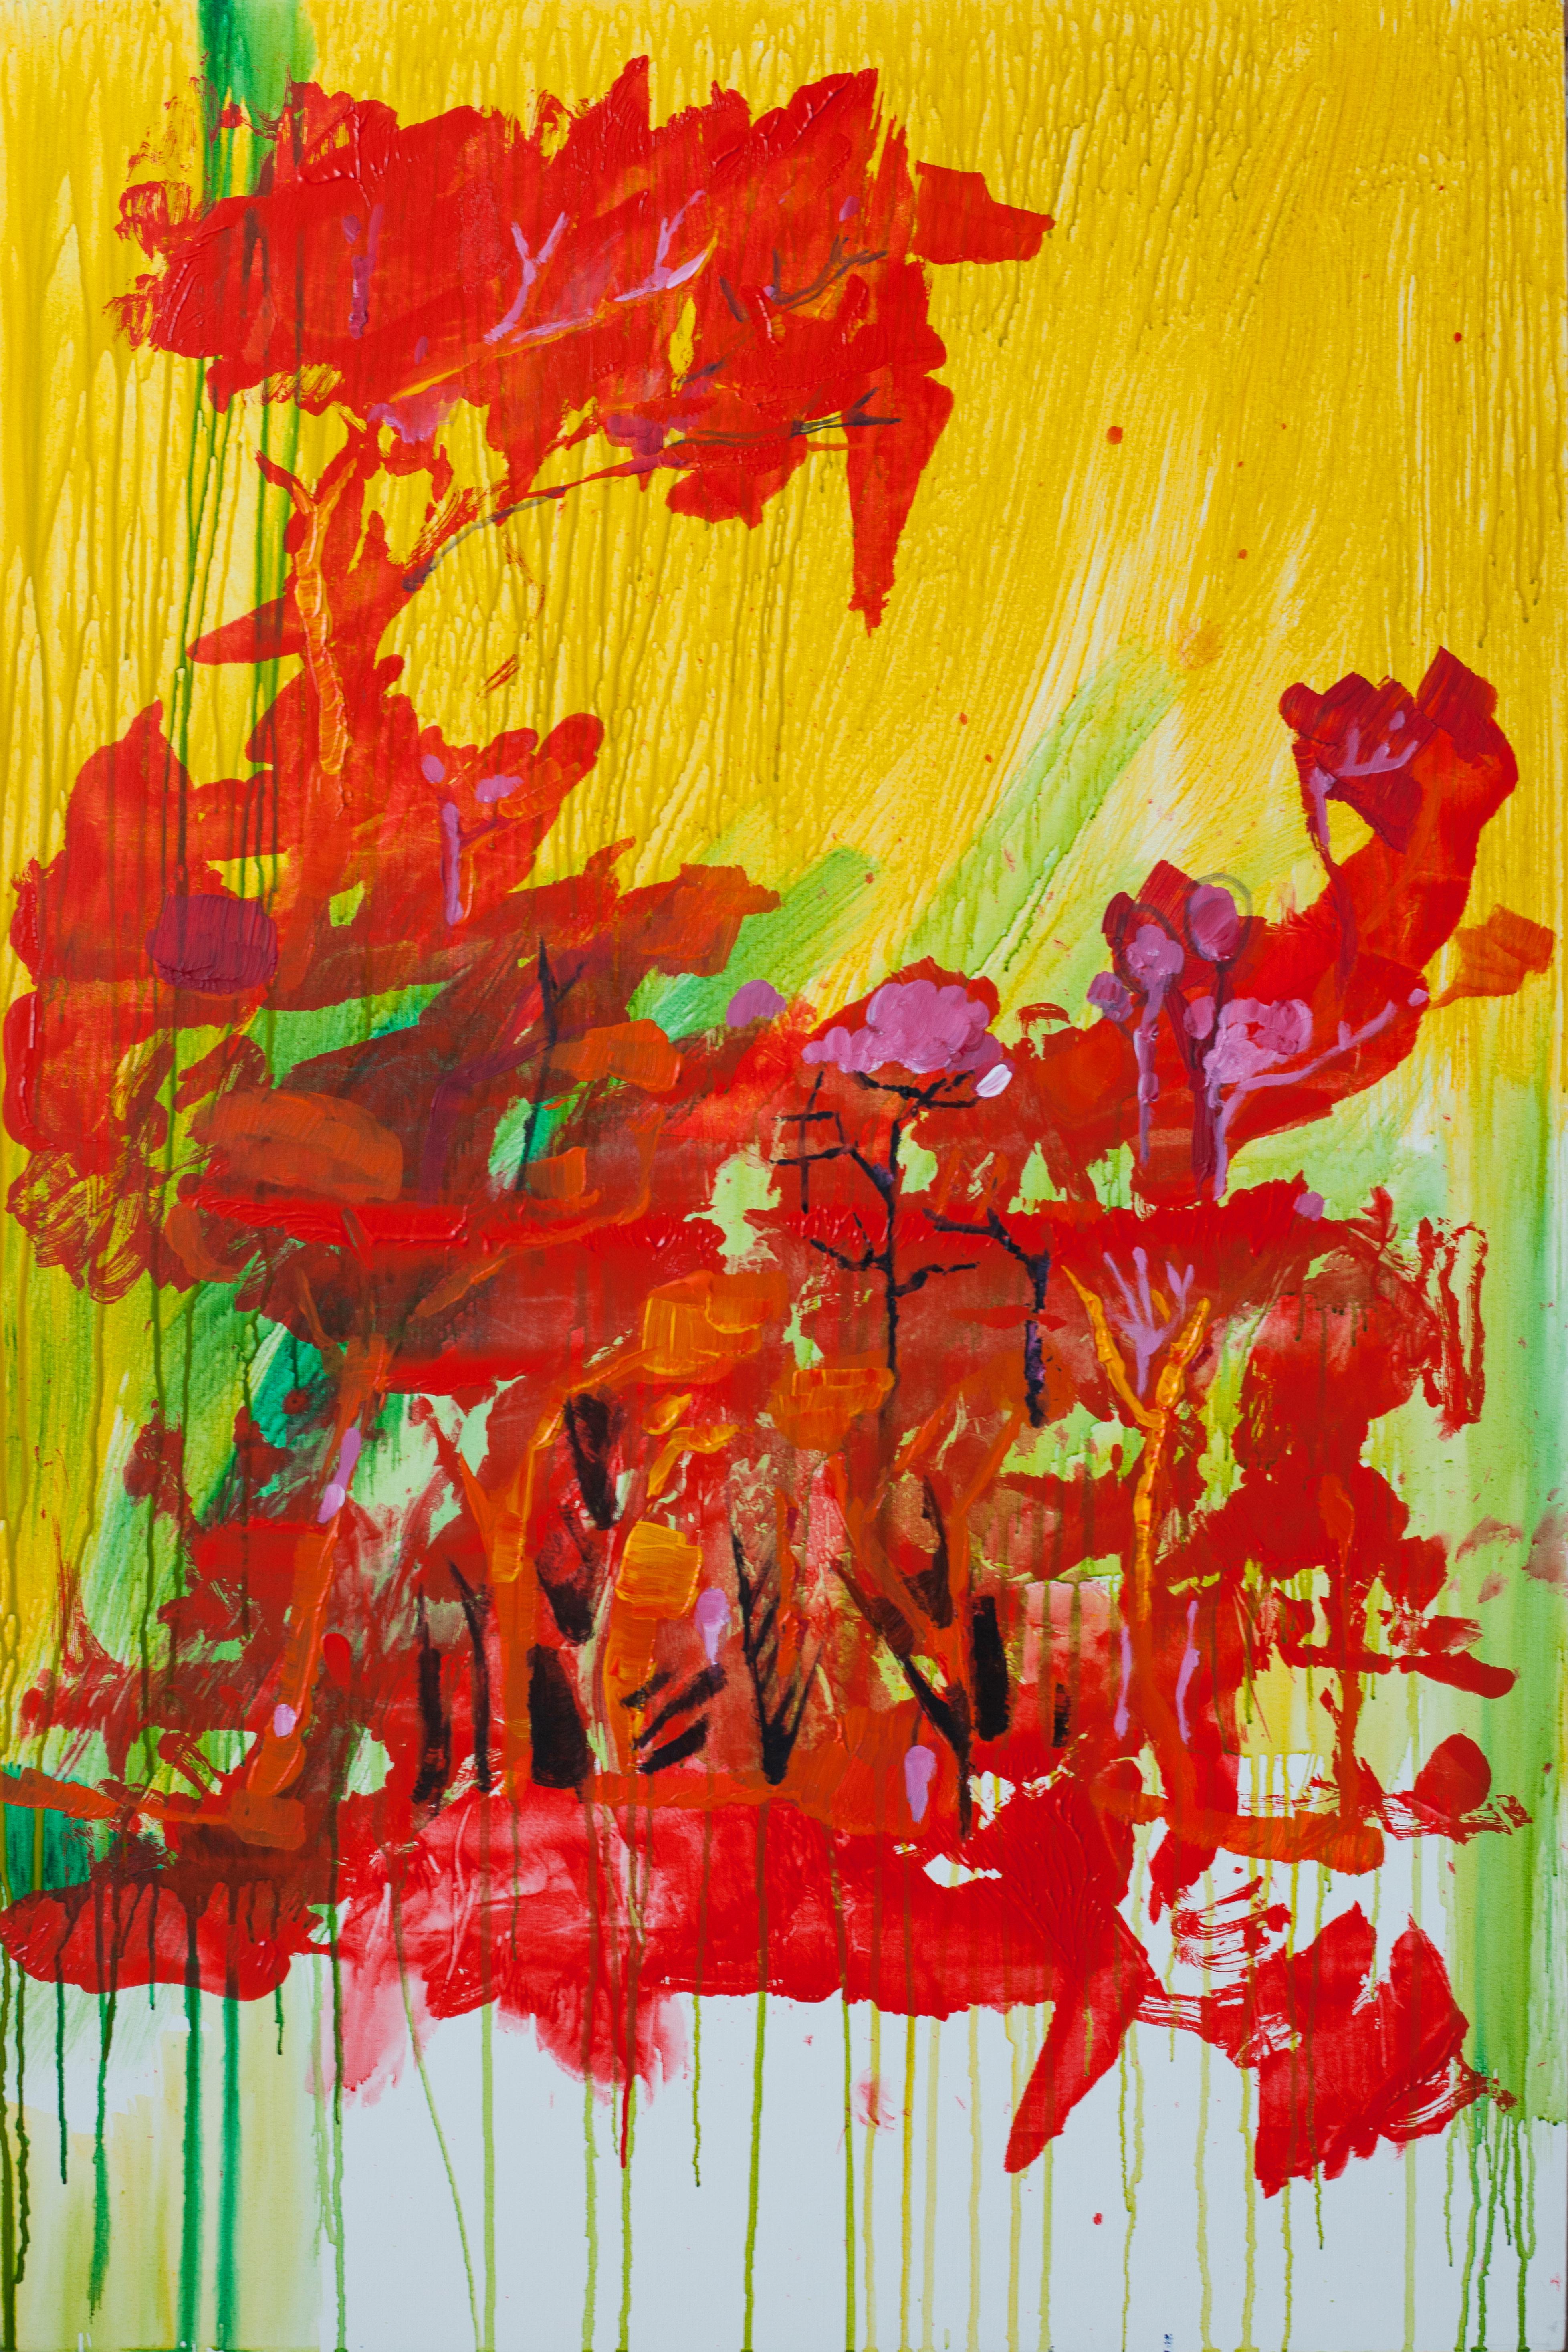 MEKONG 11_acrilic on canvas 120x80